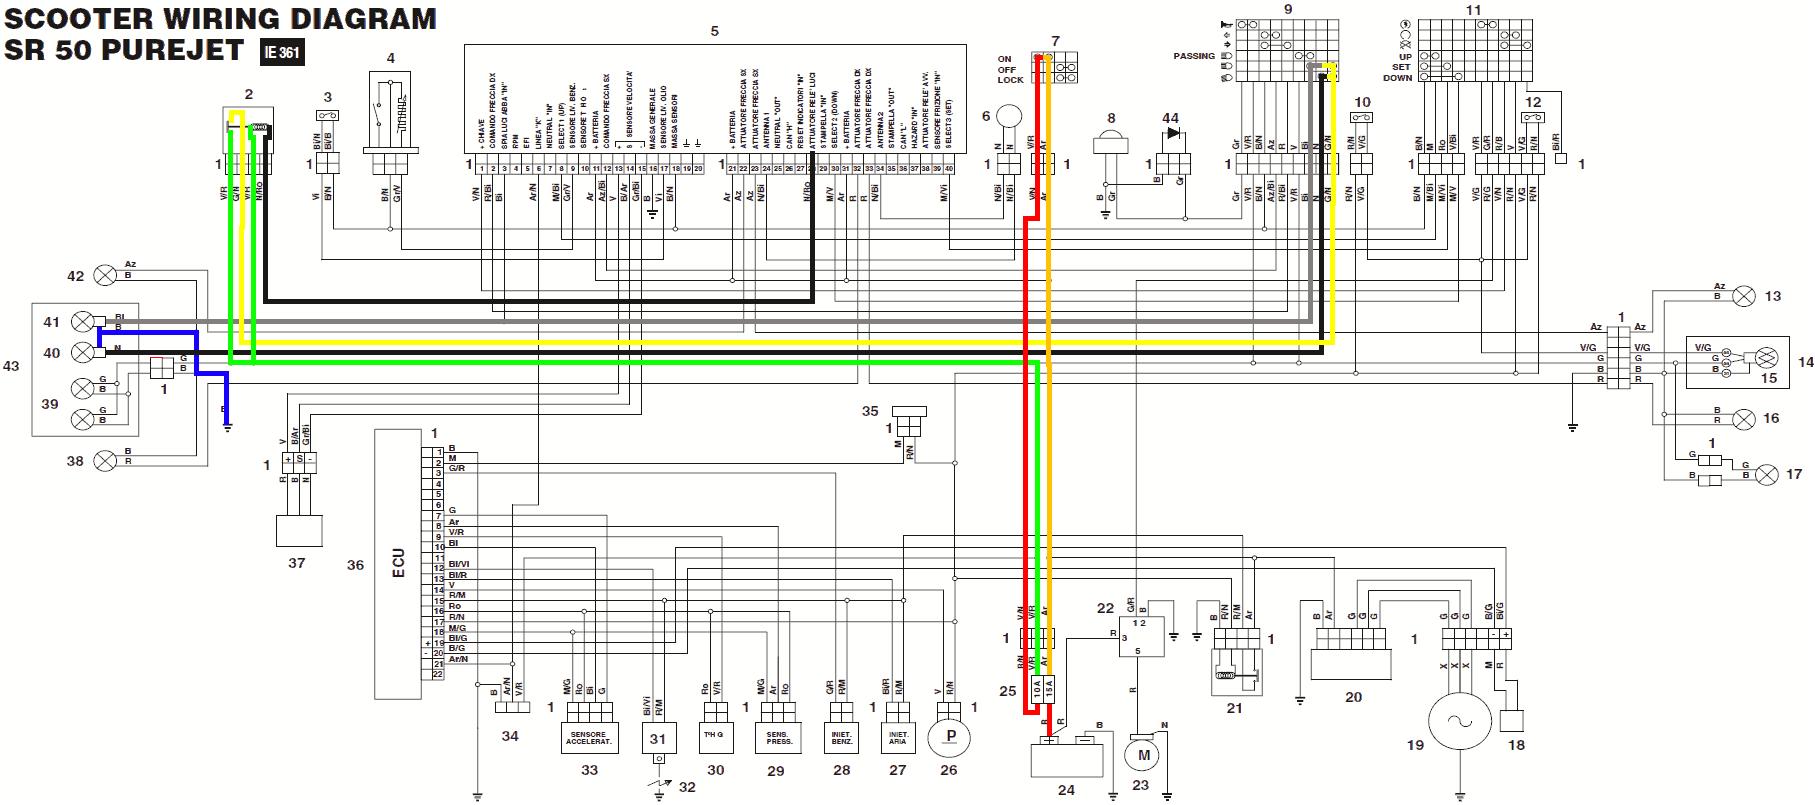 aprilia sr 50 2005 wiring diagram wiring diagram used aprilia wiring diagram aprilia sr 50 2005